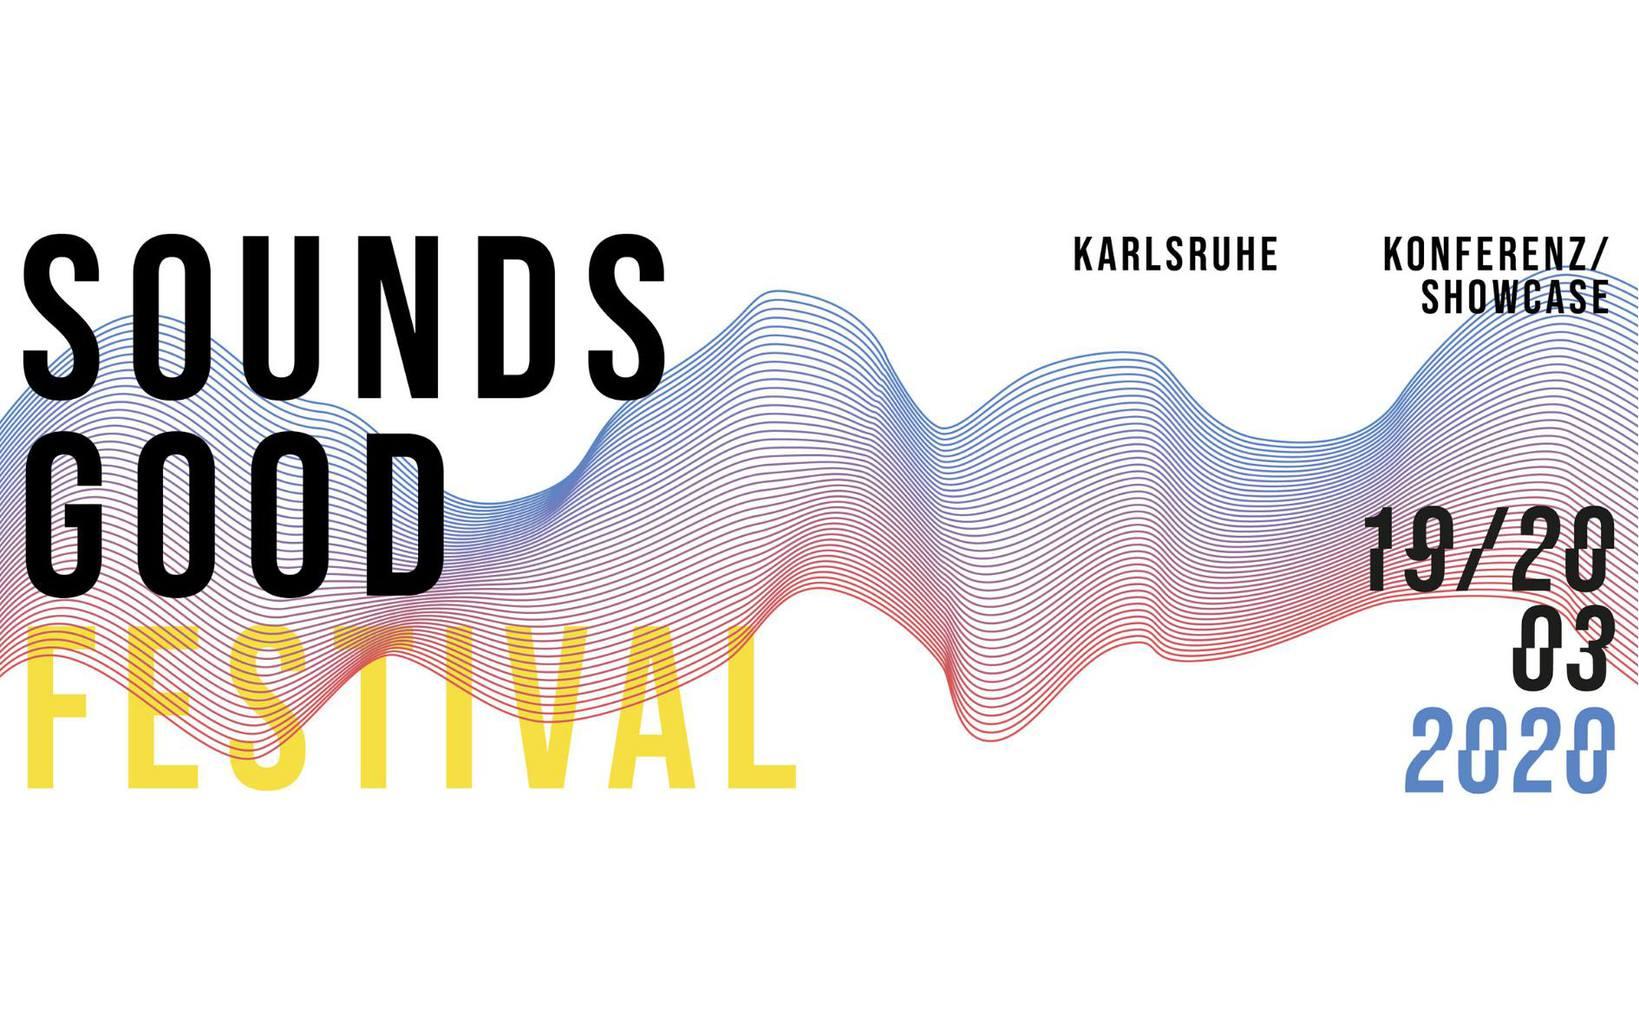 Soundsgood festival 2020